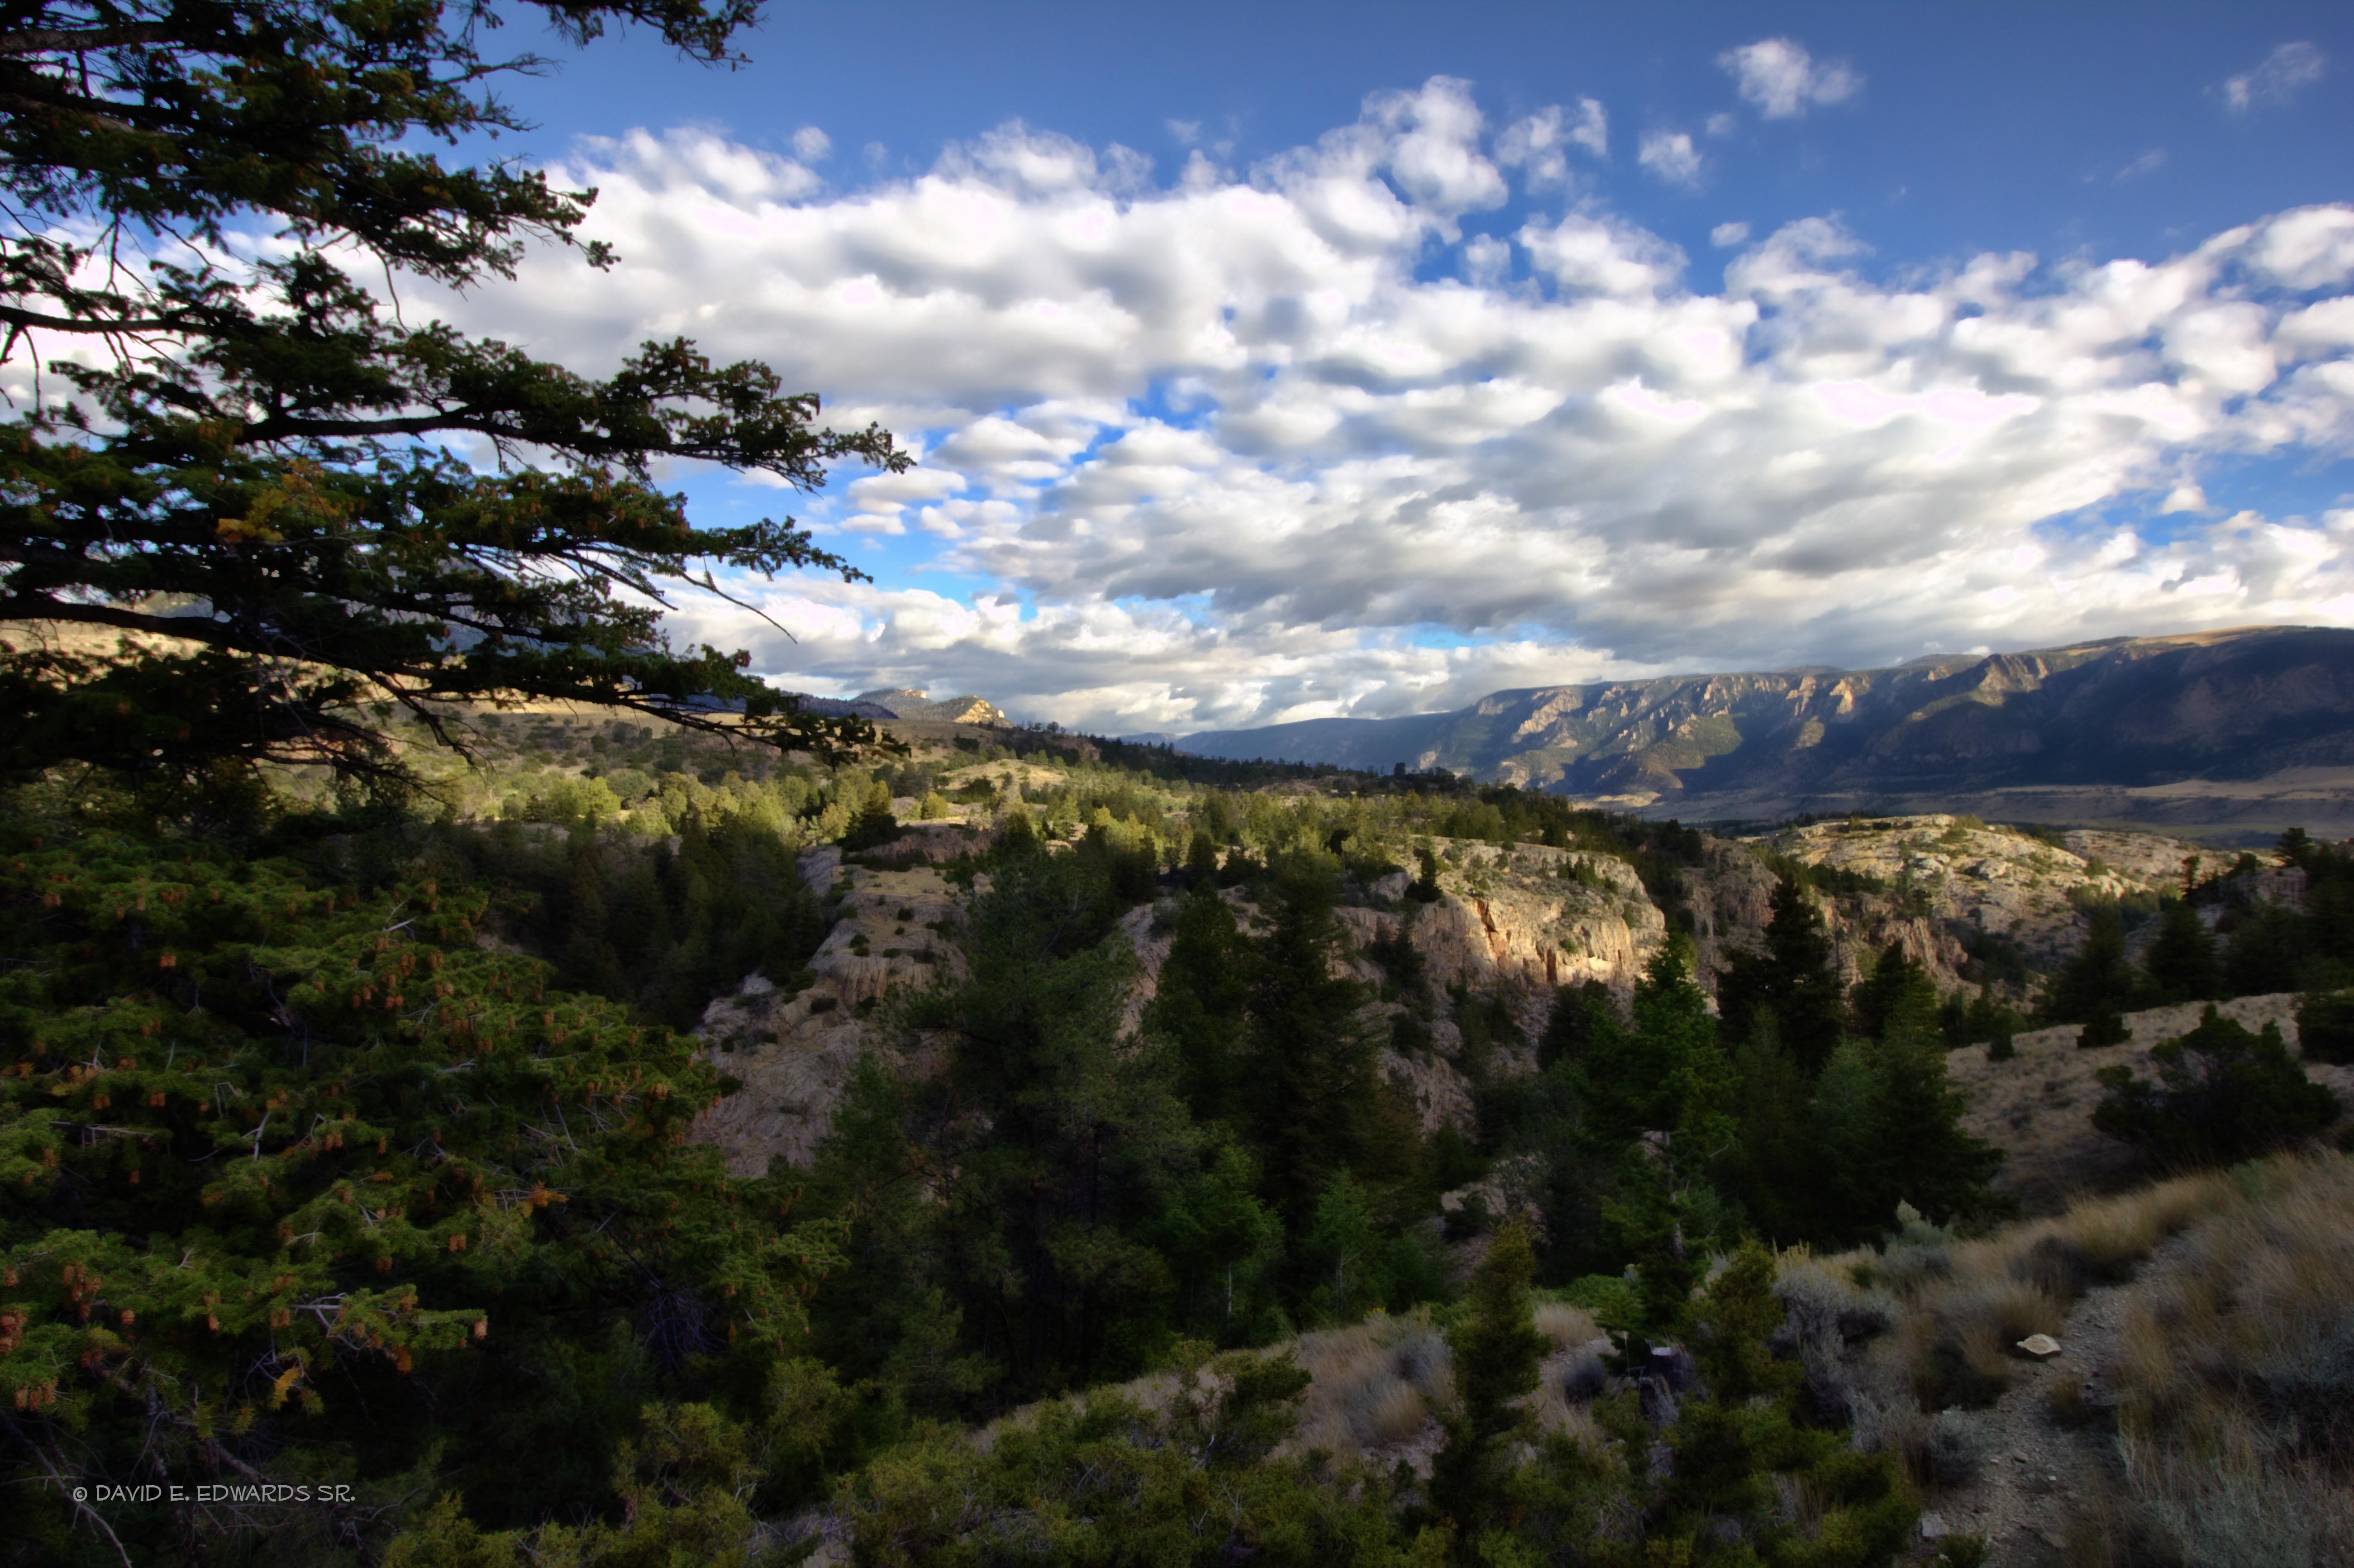 Between Cody and Yellowstone